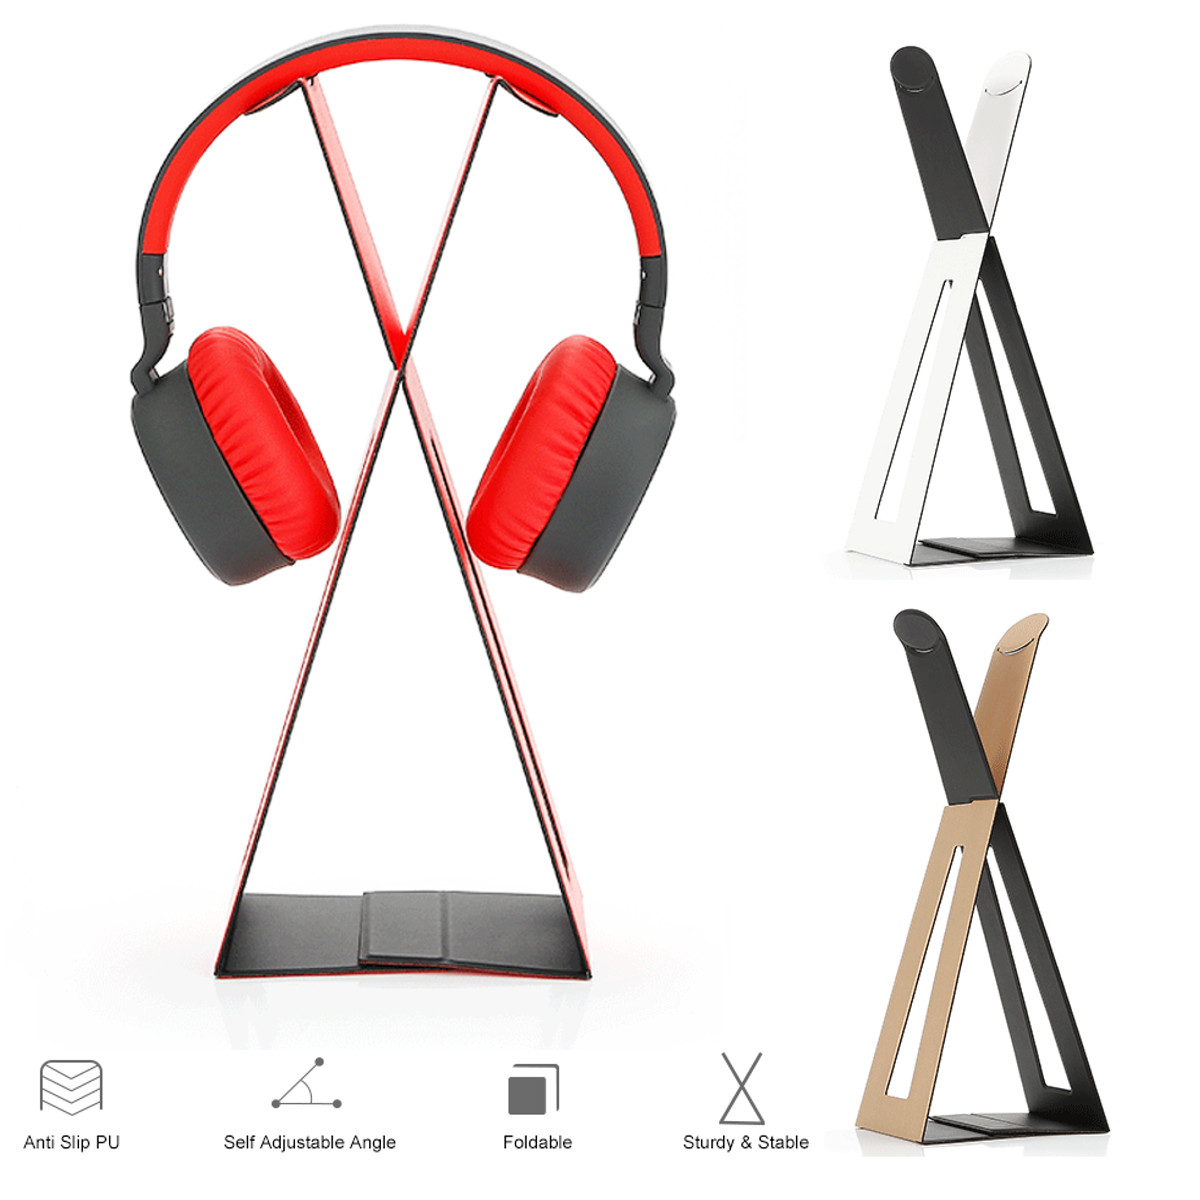 Folding Headset Earphone Rack Holder Headphone Stand Display Hanger Storage Bracket Organizer Portable Headphone Accessories